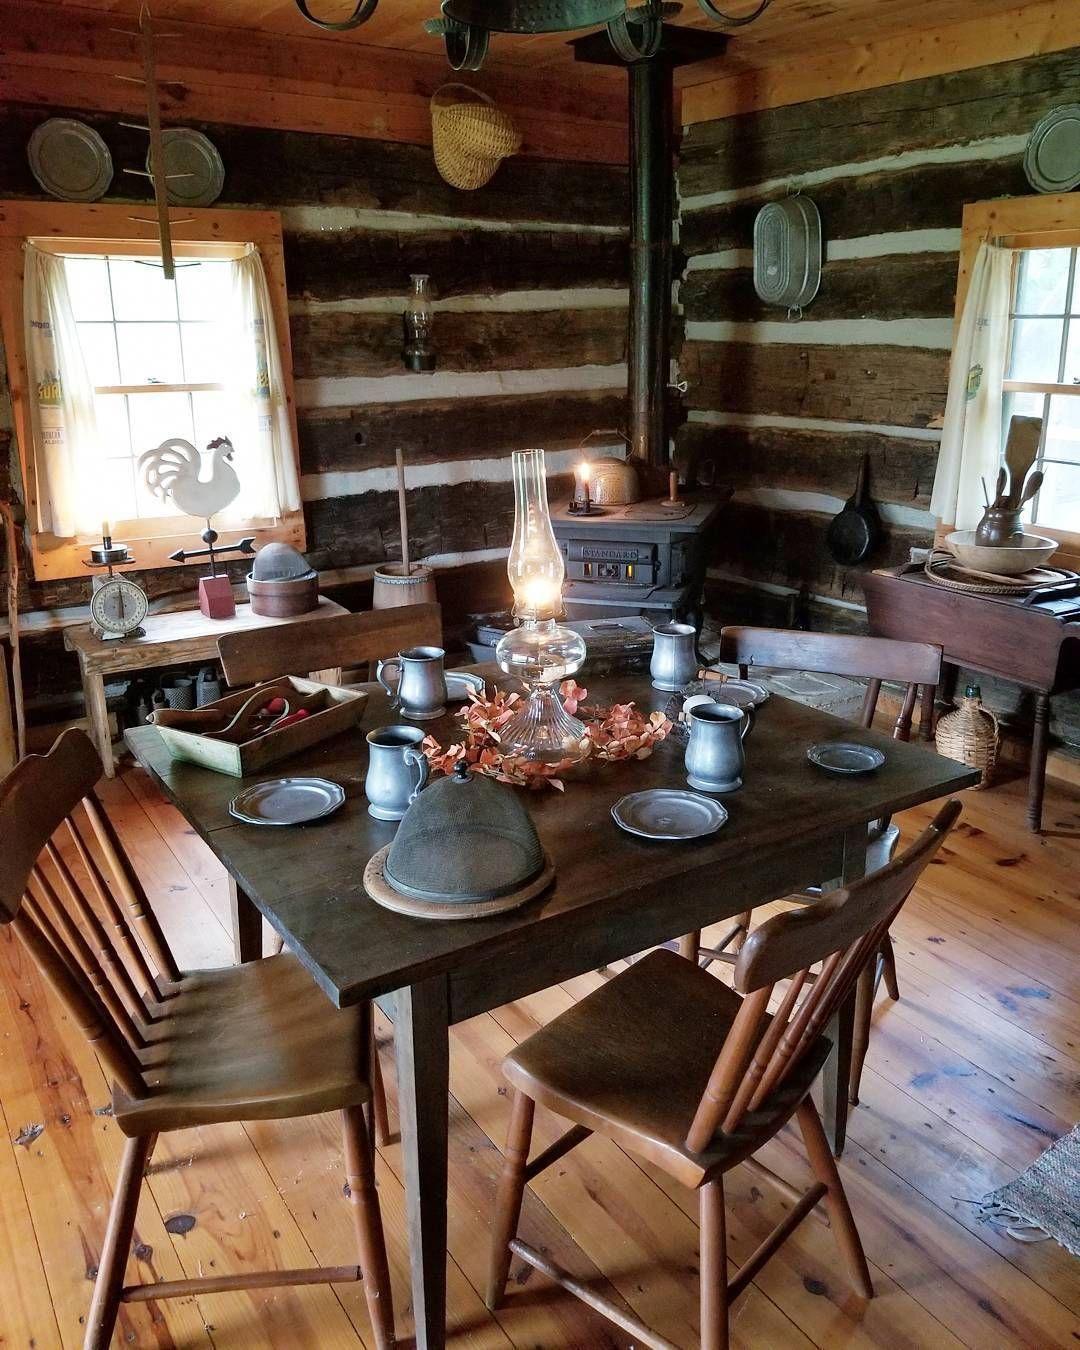 14 Traditional Style Home Decor Ideas That Are Still Cool: Farmhouse Log Cabin Decor. #farmhouse #logcabin #antique